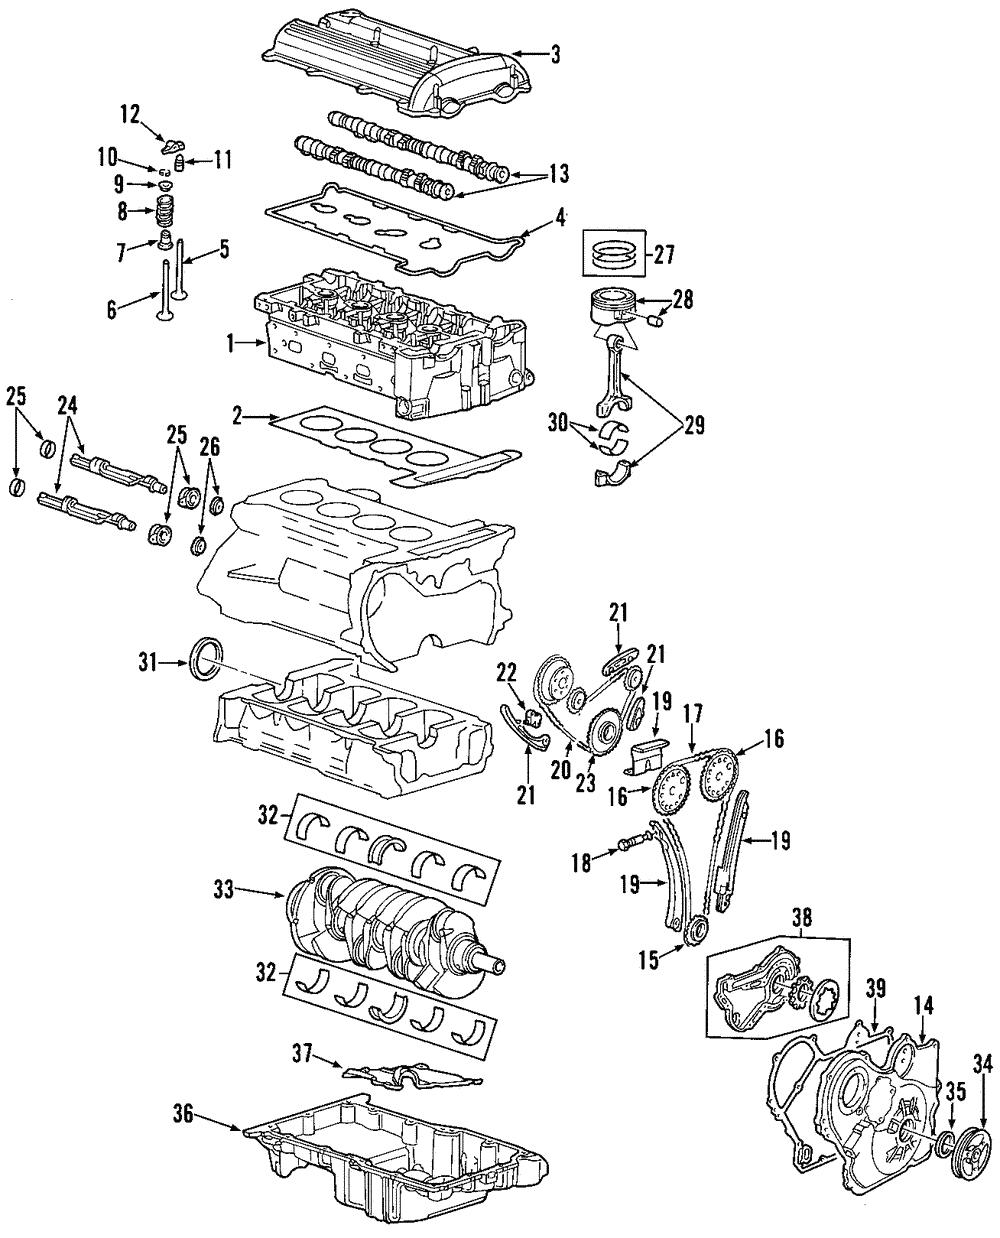 Genuine GM Piston Rings 21018813